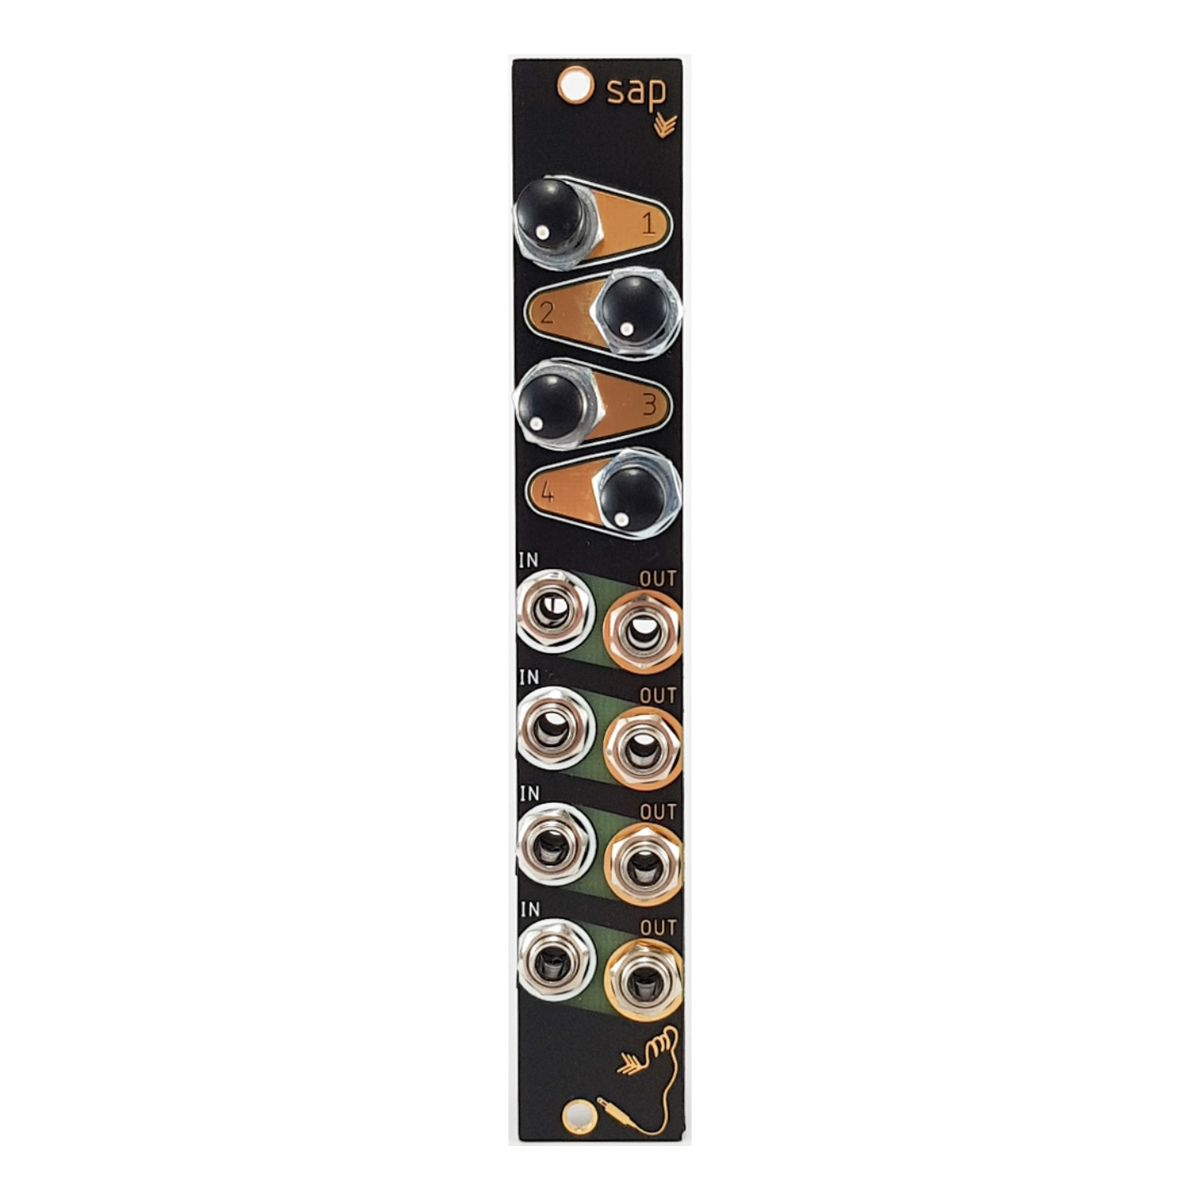 Tenderfoot Sap 4-Channel Passive Attenuator Eurorack Module